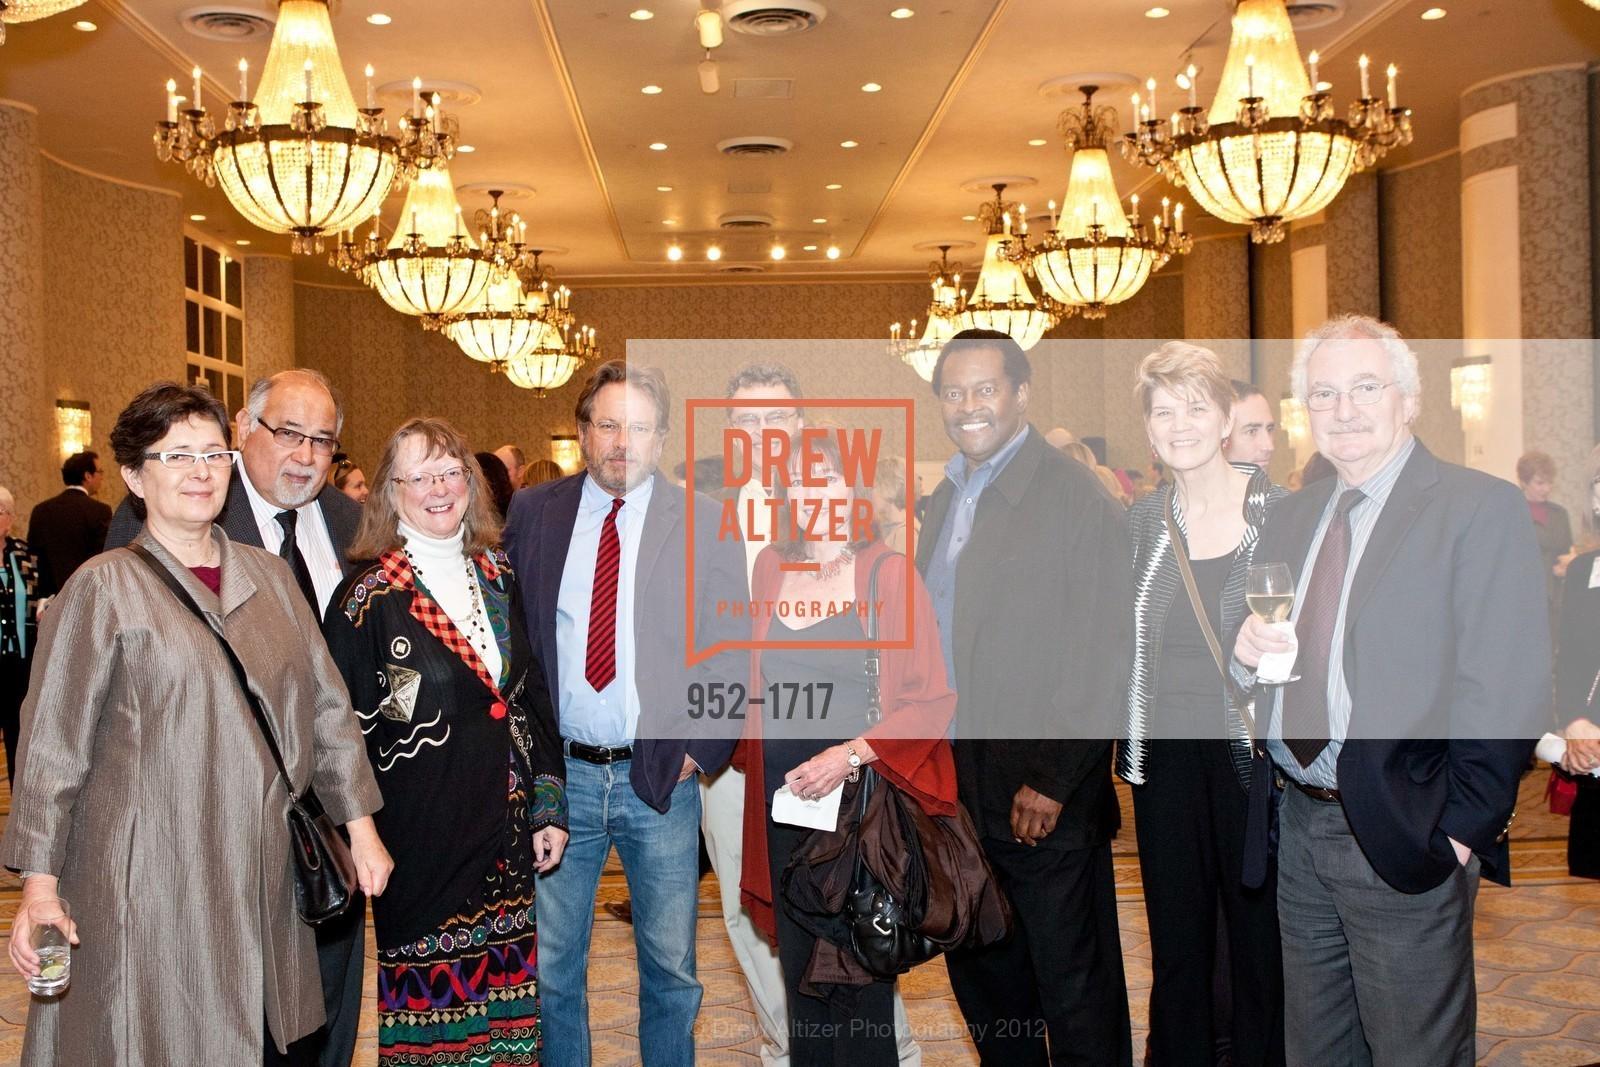 Laura Taylor, Sam Chavez, Jackie Sarte, Kurt Sanborn, Bill Wanamaker, Melanie Chickering-Allen, Mark Taylor, Mary Chavez, Photo #952-1717